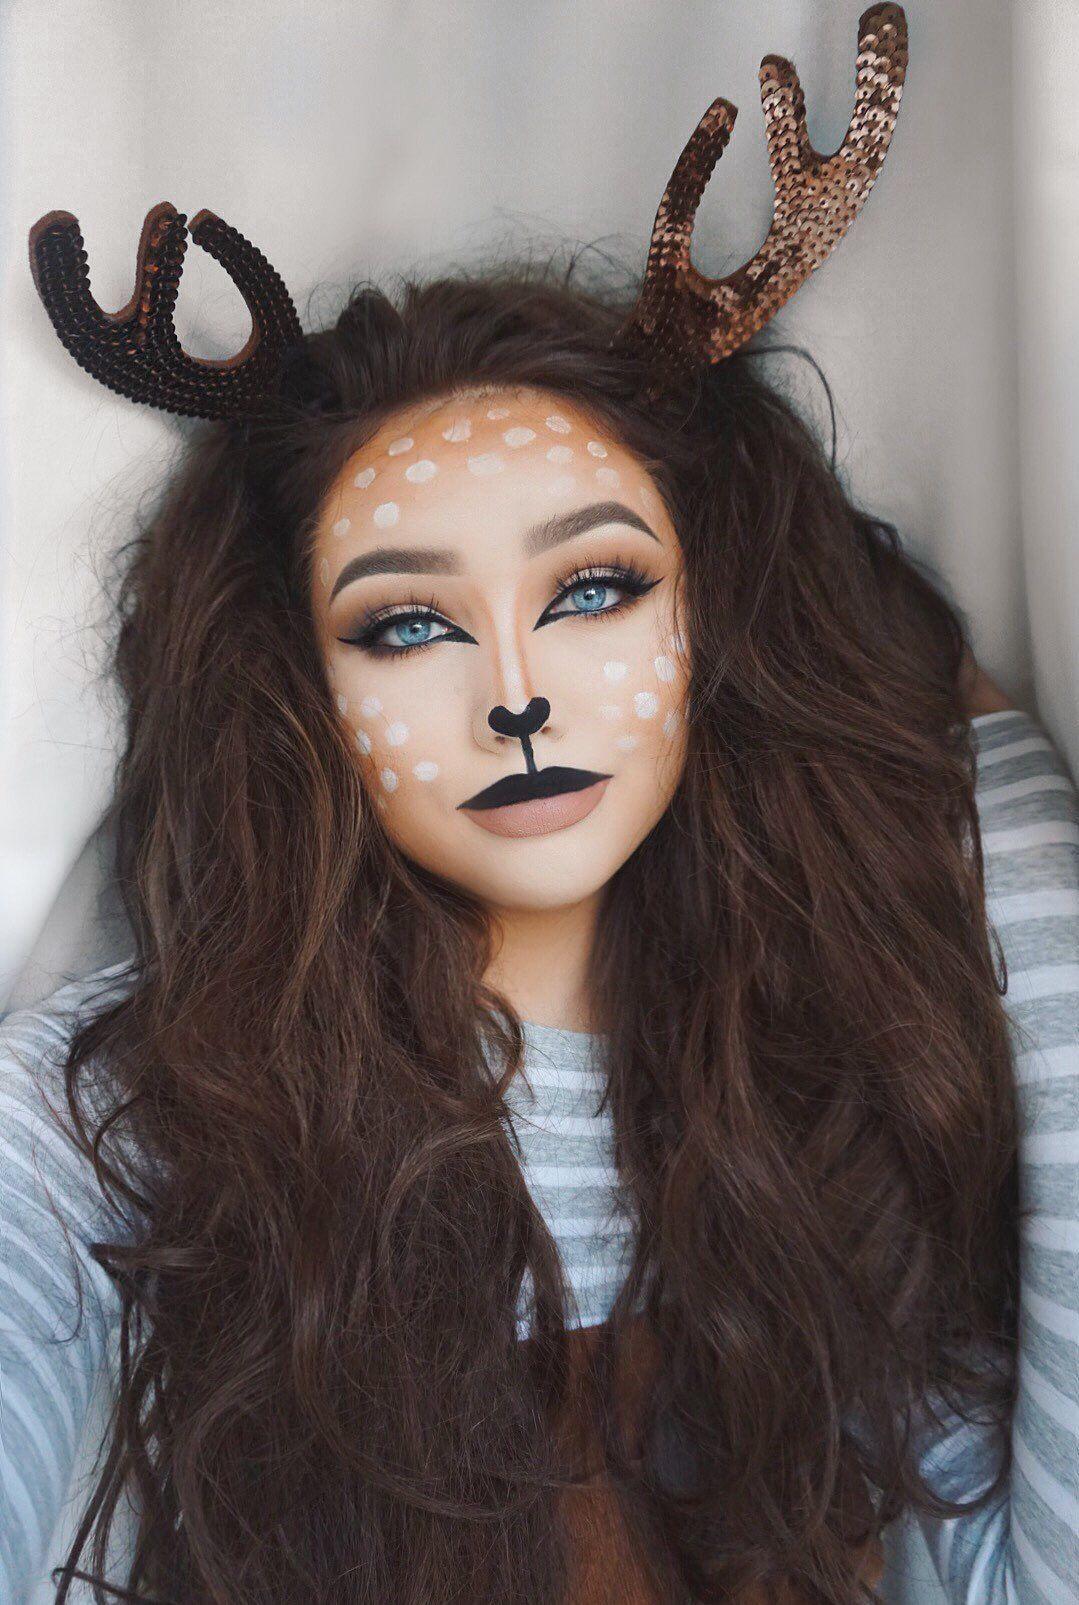 deer snapchat filter (With images) Snapchat deer makeup